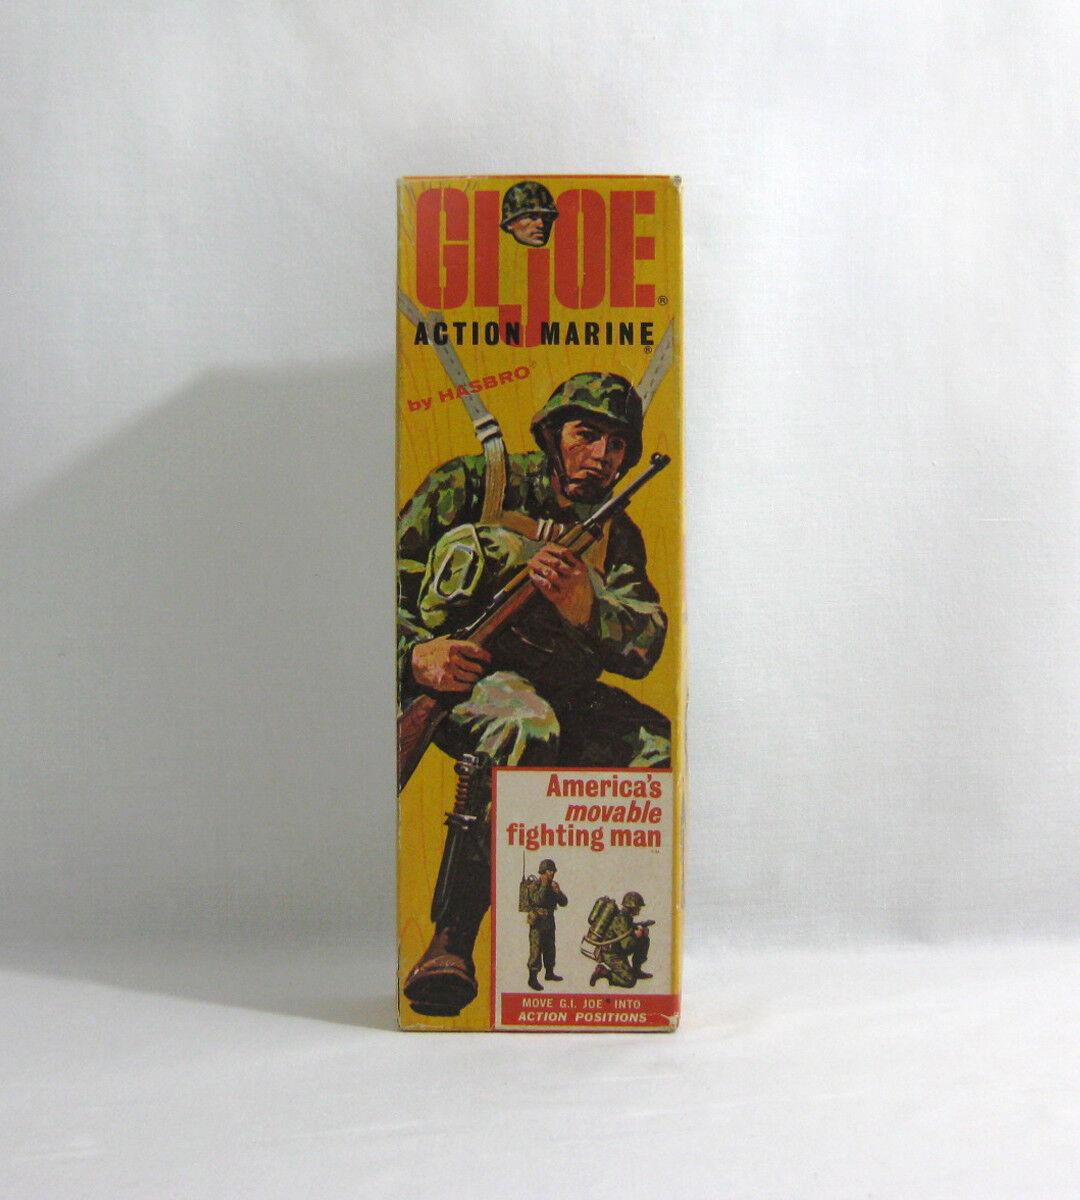 C1967 Vintage G.I Joe ✧ Action Marine ✧ R/R Stamp Hasbro Action Man VAM  2